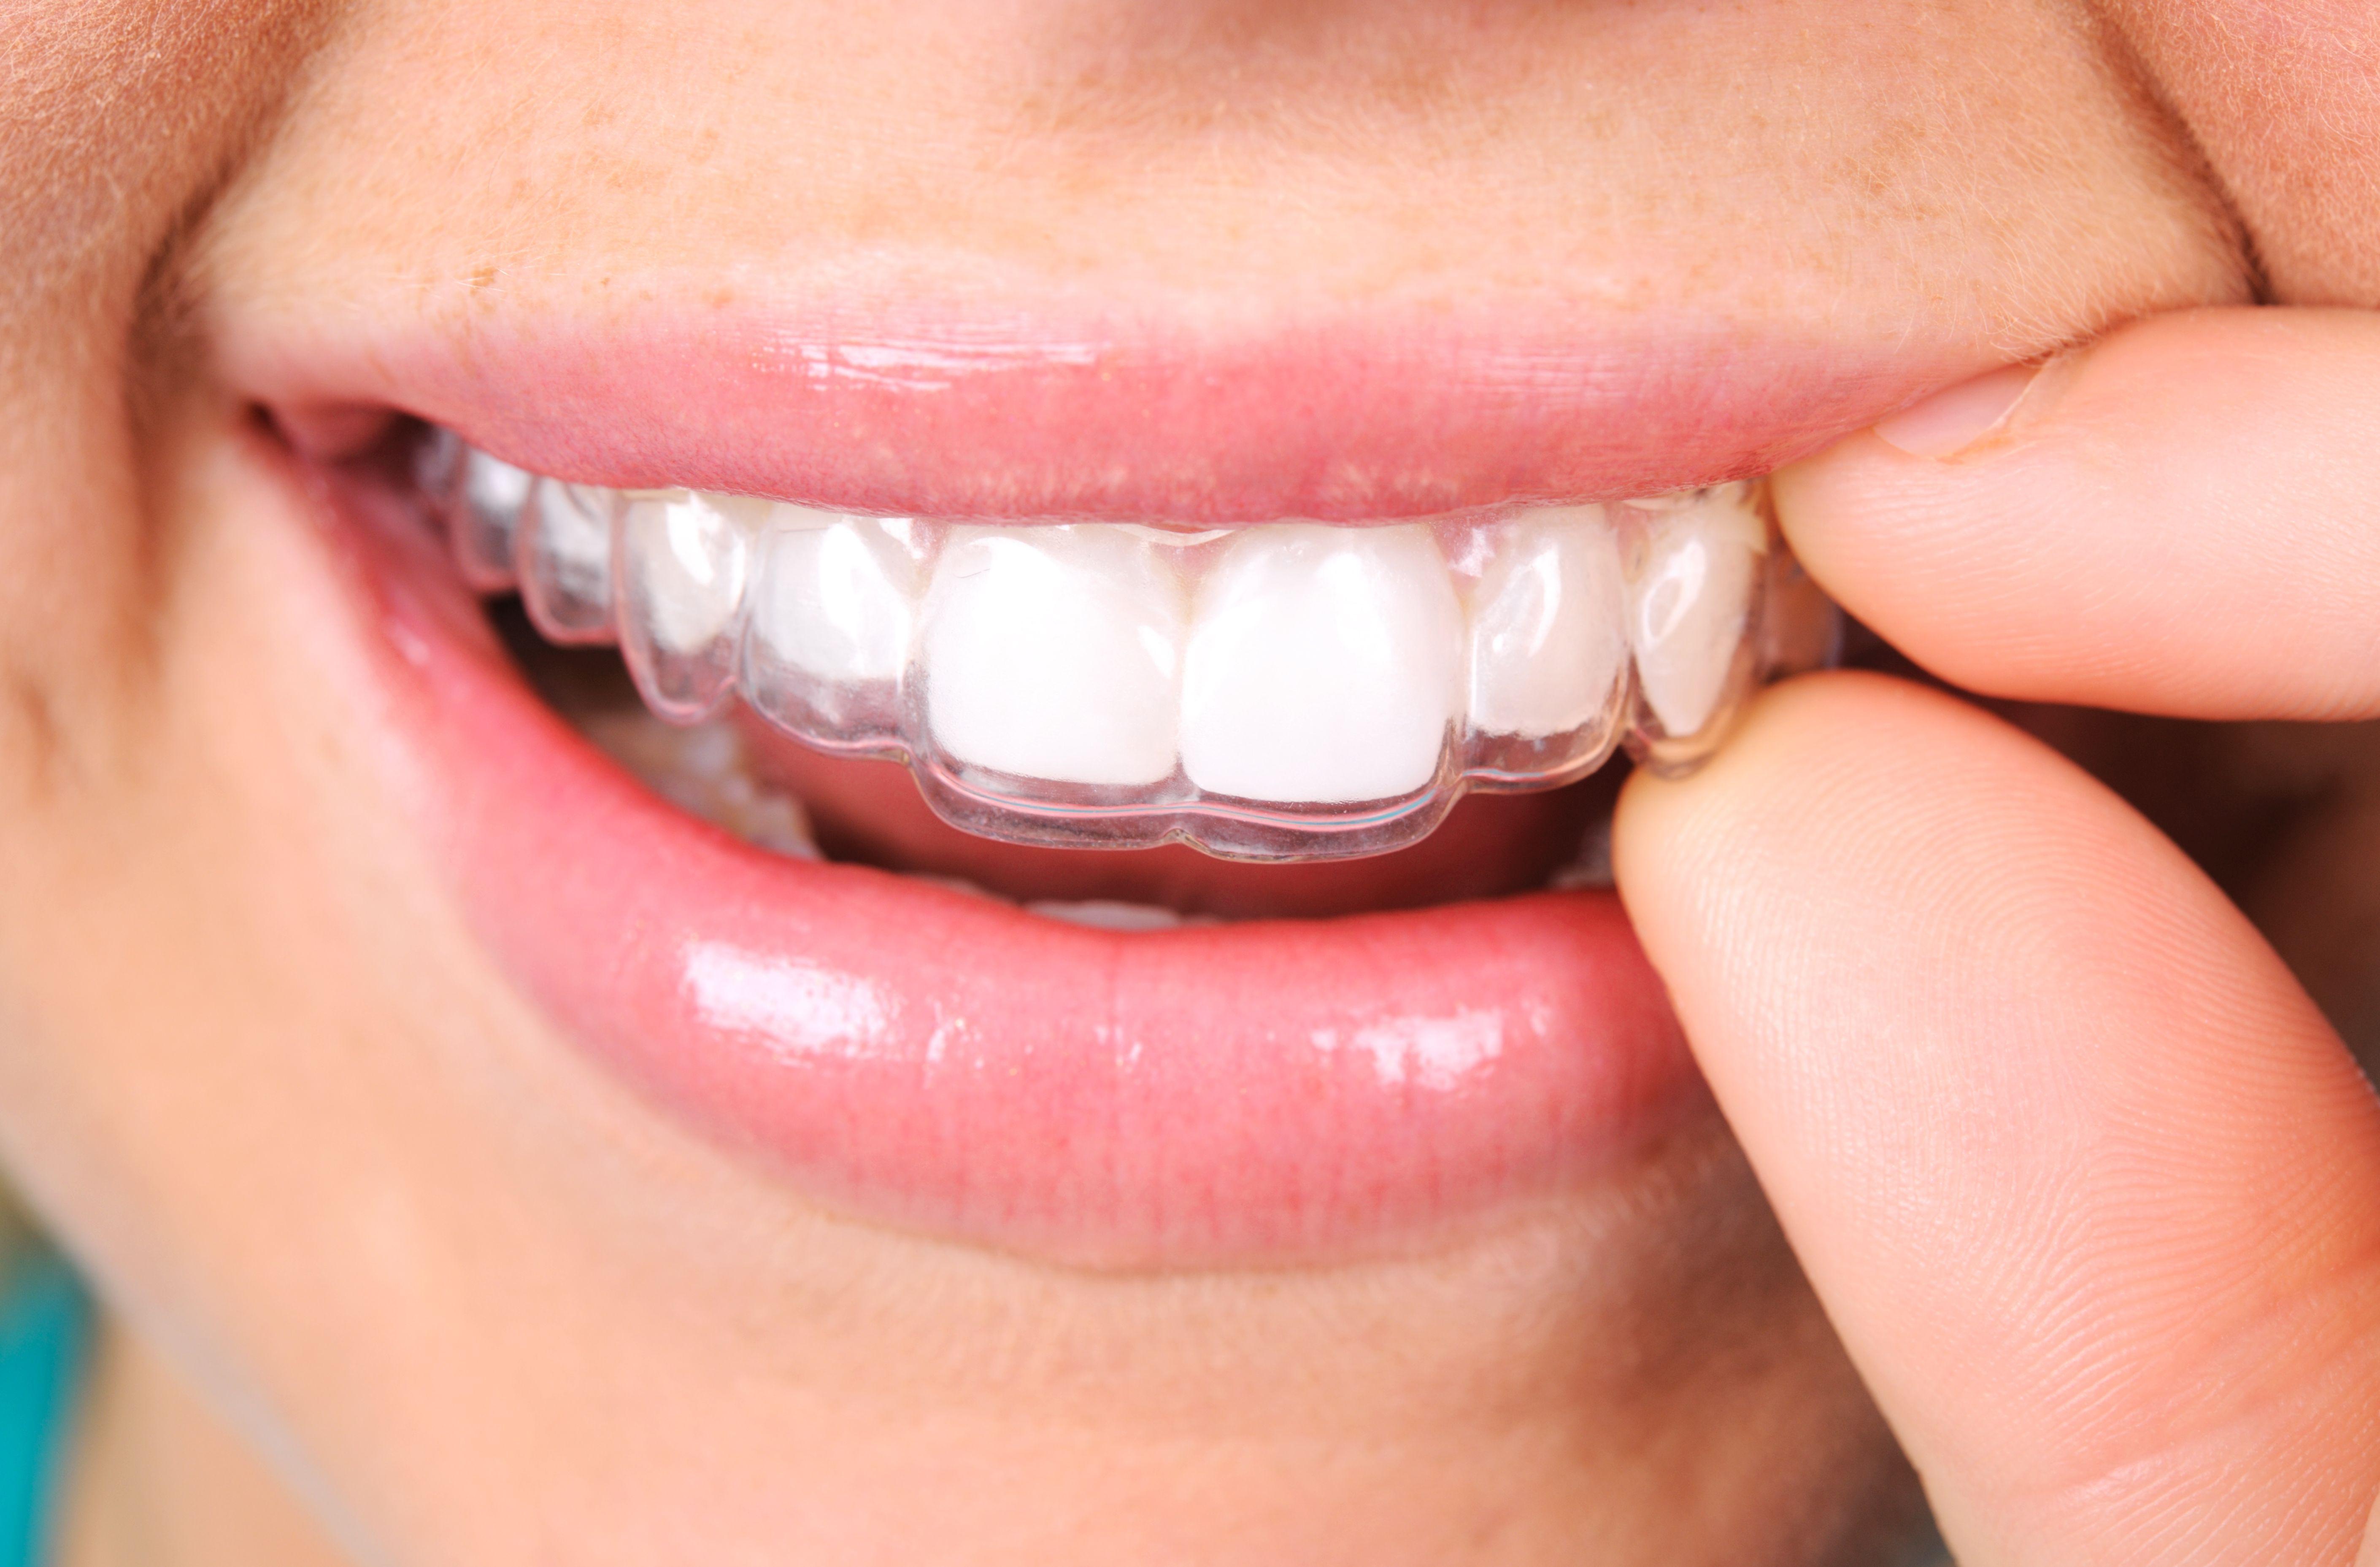 Estética dental: Tratamientos de My Clinic